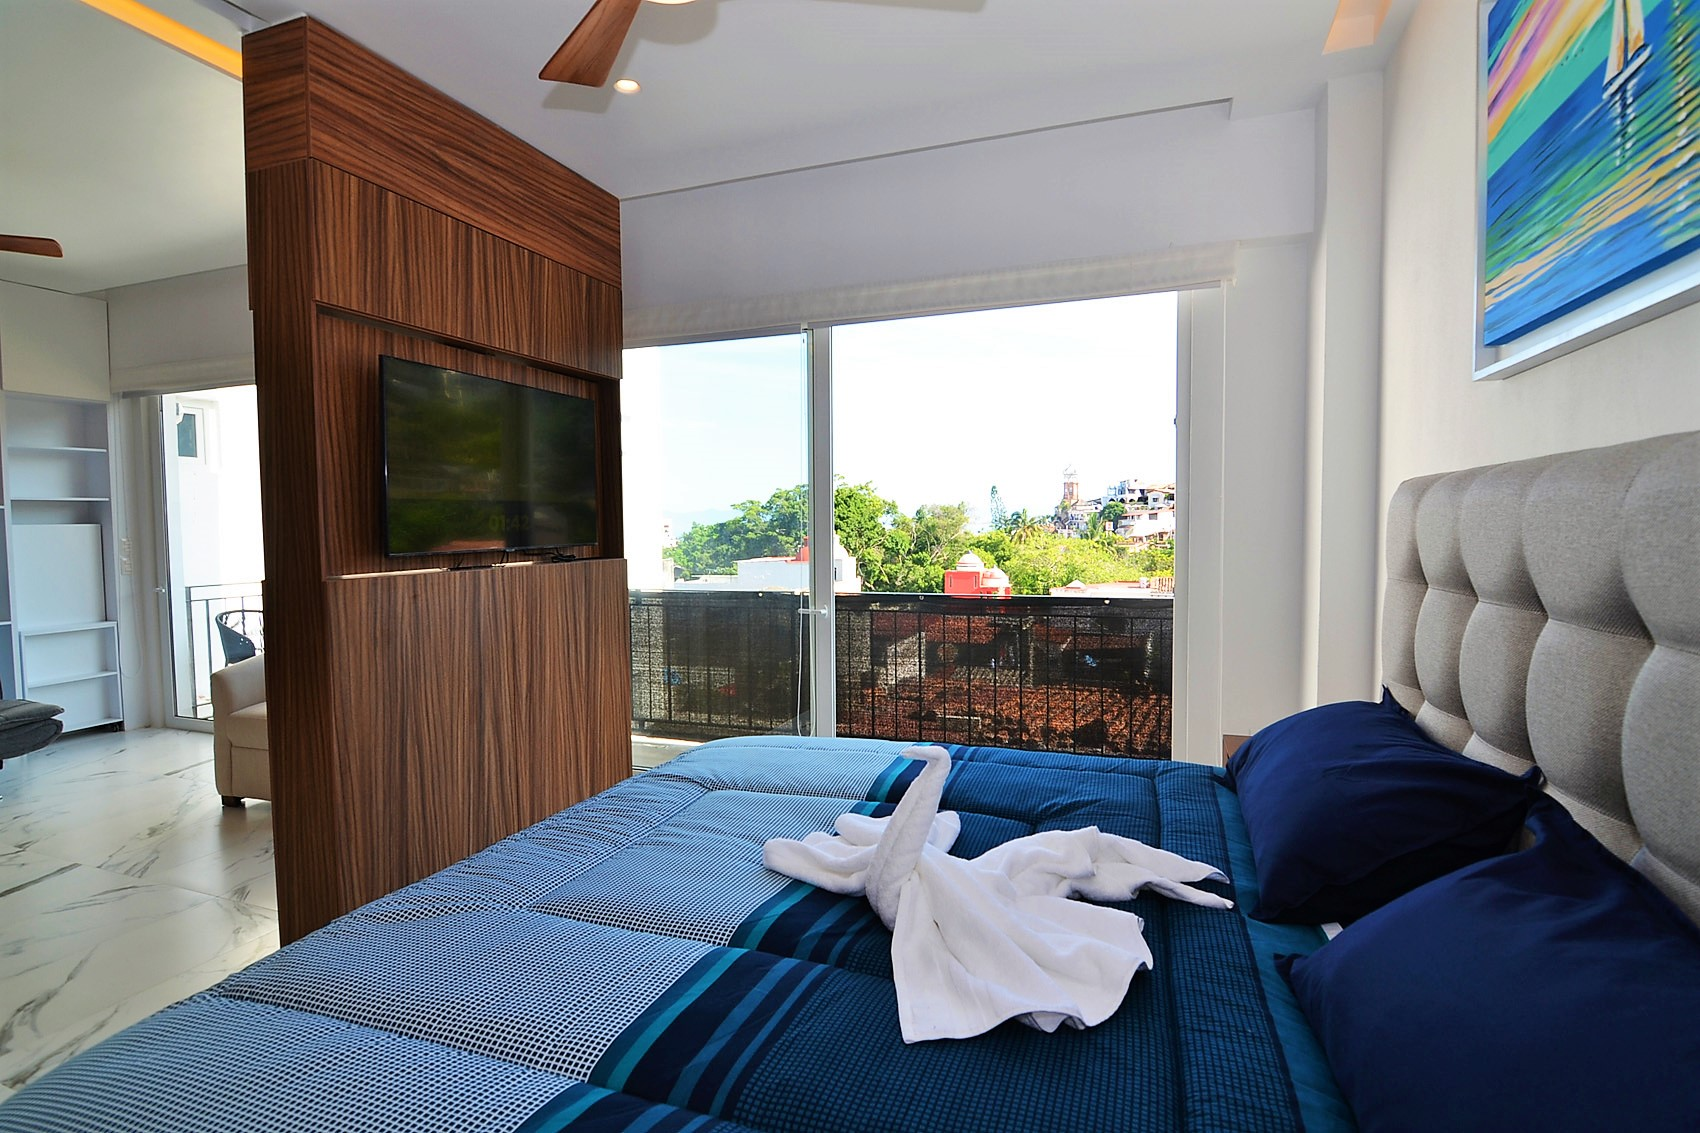 Condo Avida Super Studio 4 - Puerto Vallarta Furnished Condo Romantic Zone (27)